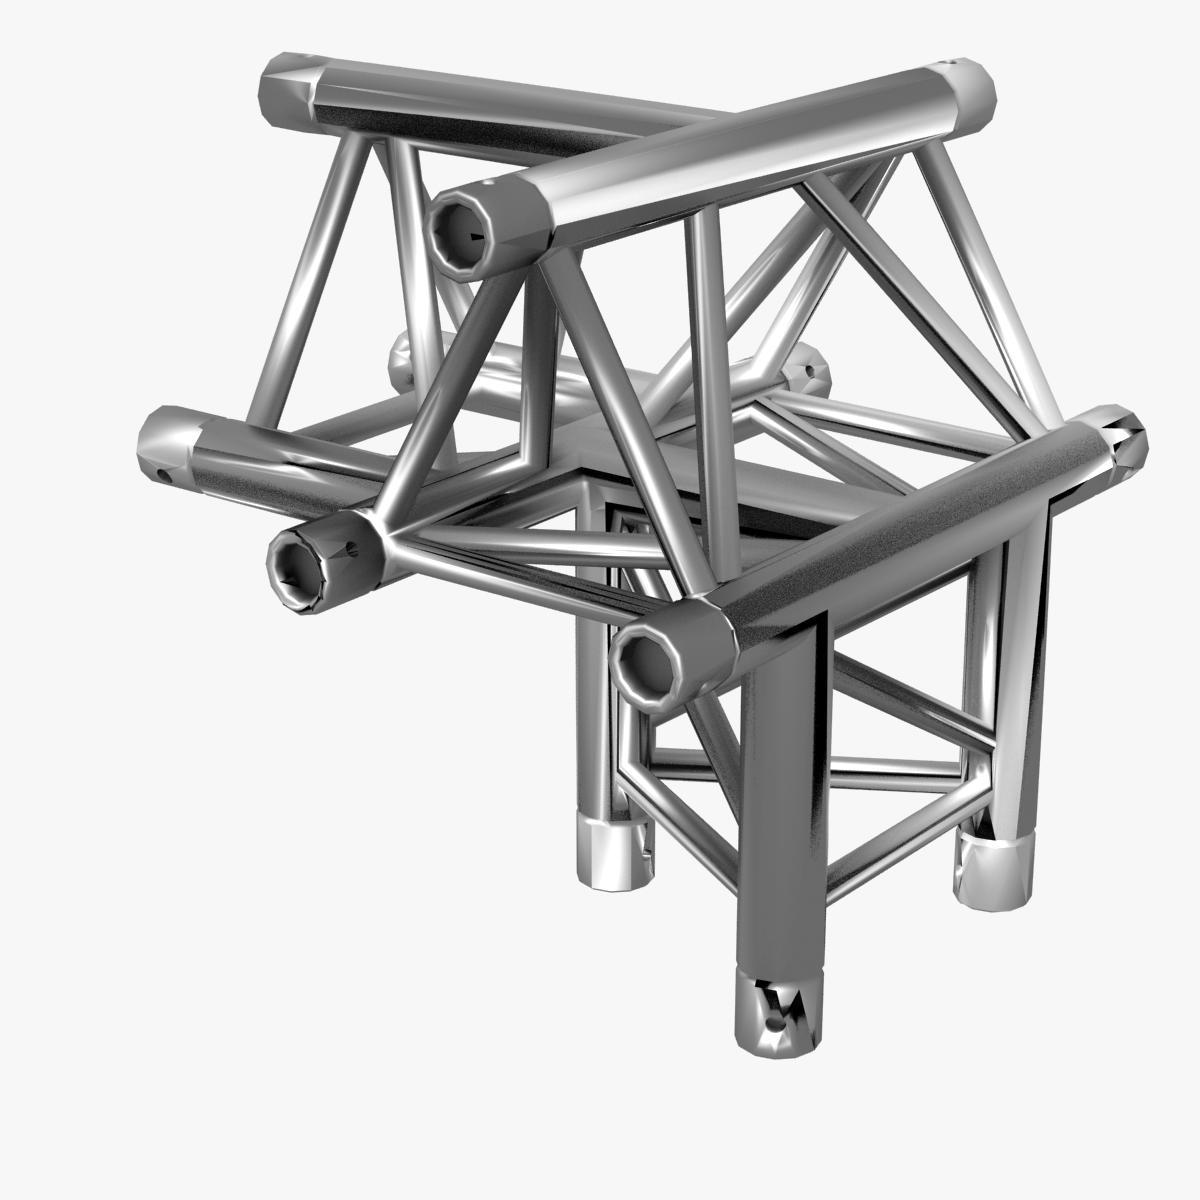 triangular trusses (collection 55 modular pieces) 3d model 3ds max dxf fbx c4d dae texture obj 216224